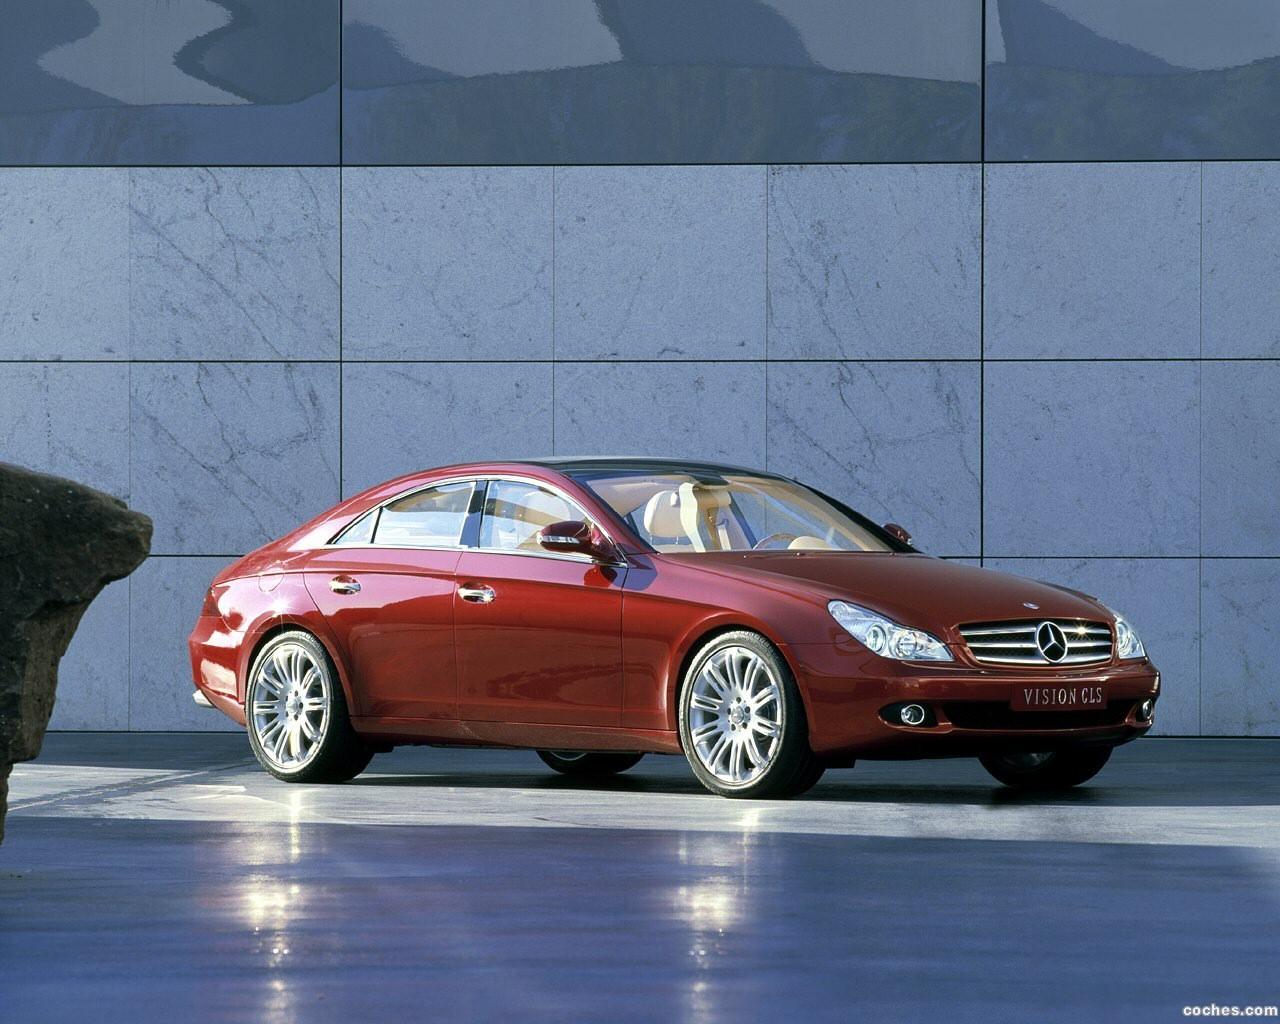 Foto 0 de Mercedes Vision CLS Concept 2003